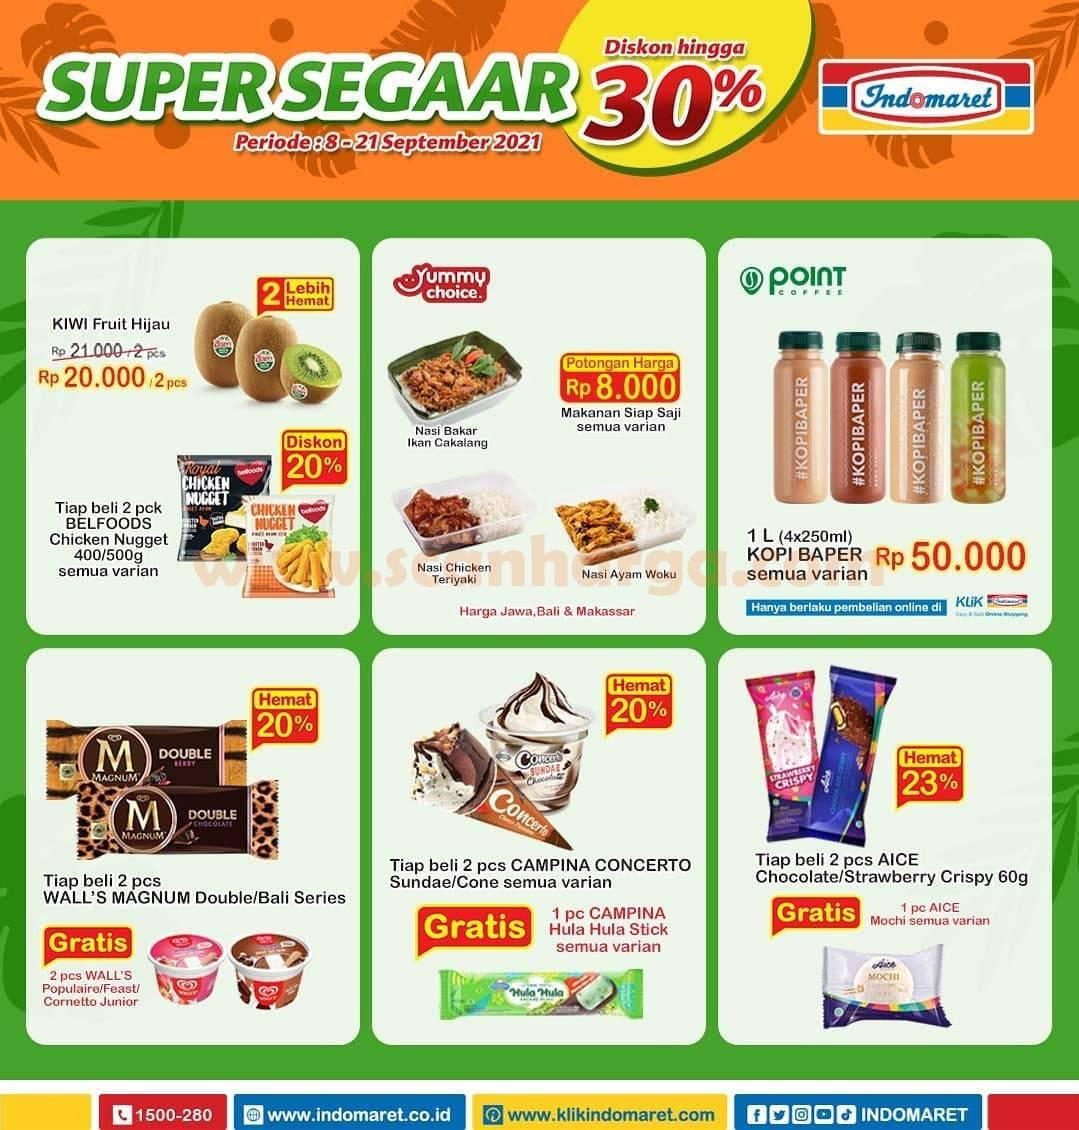 Promo INDOMARET Produk SUPER SEGAAR Periode 8 - 21 September 2021 3